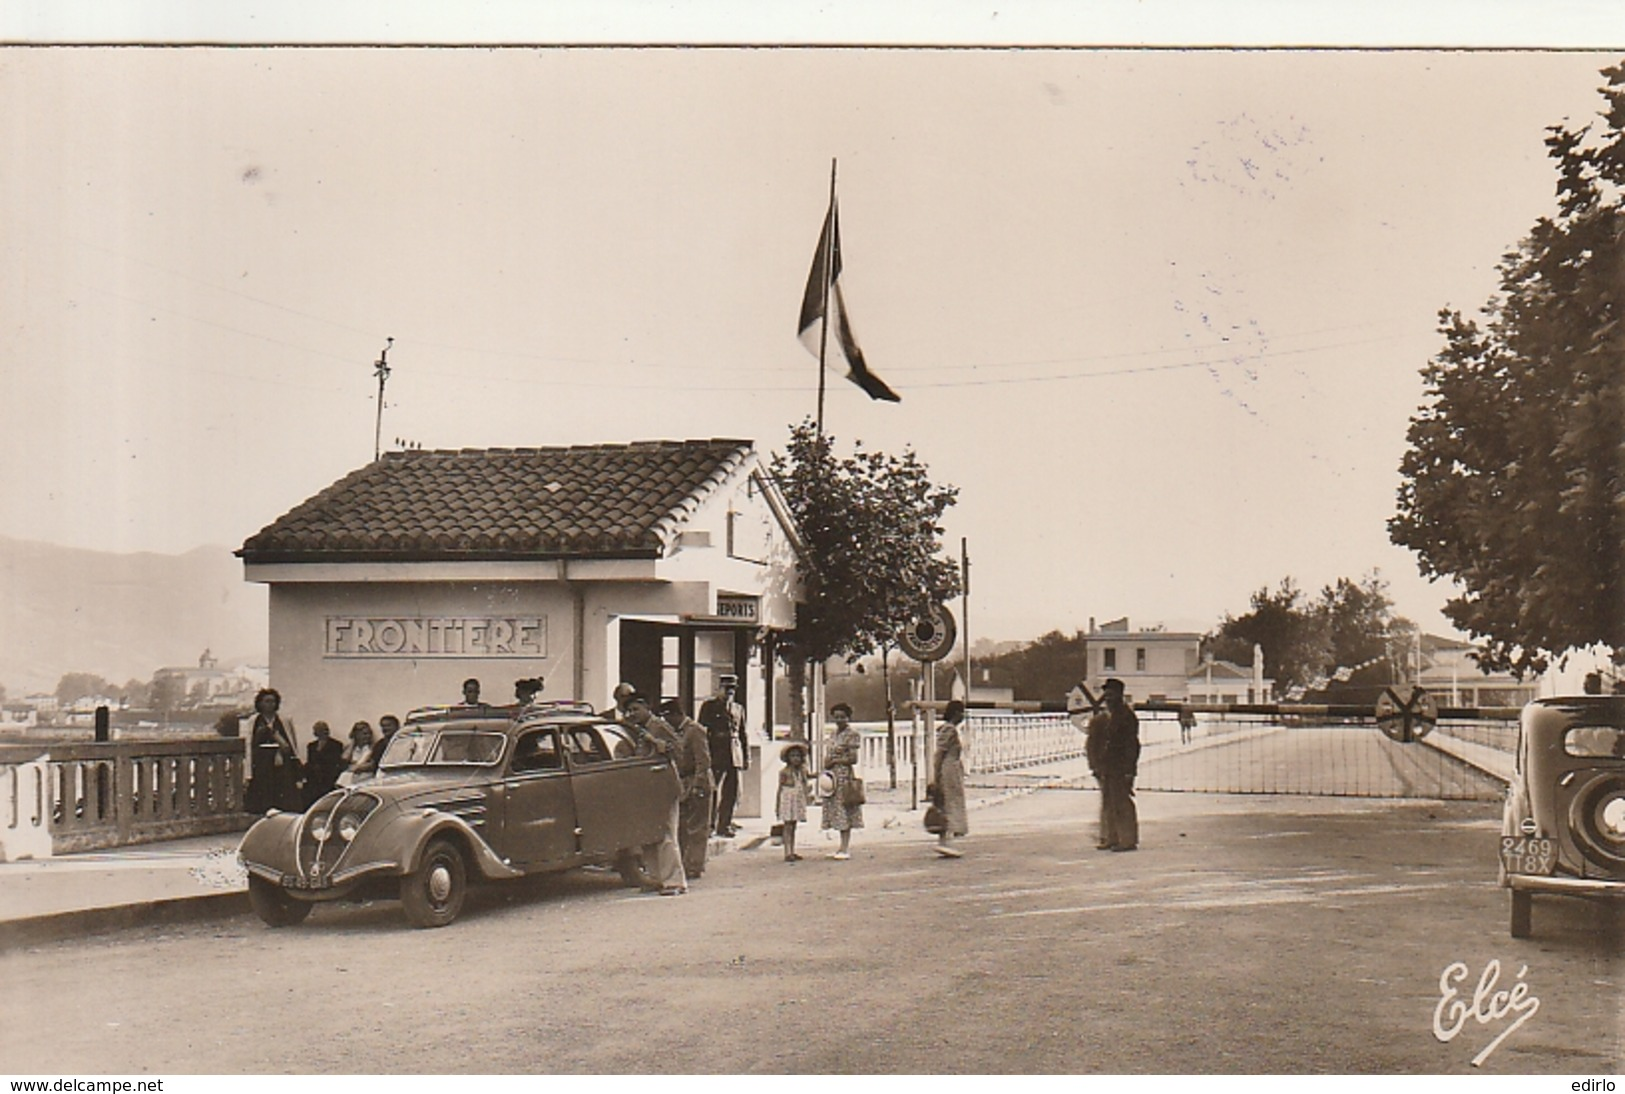 *** 64  *** HENDAYE  Frontiere Franco Espagnol - 202 Peugeot - Vieilles Voitures TTB  Neuve - Hendaye